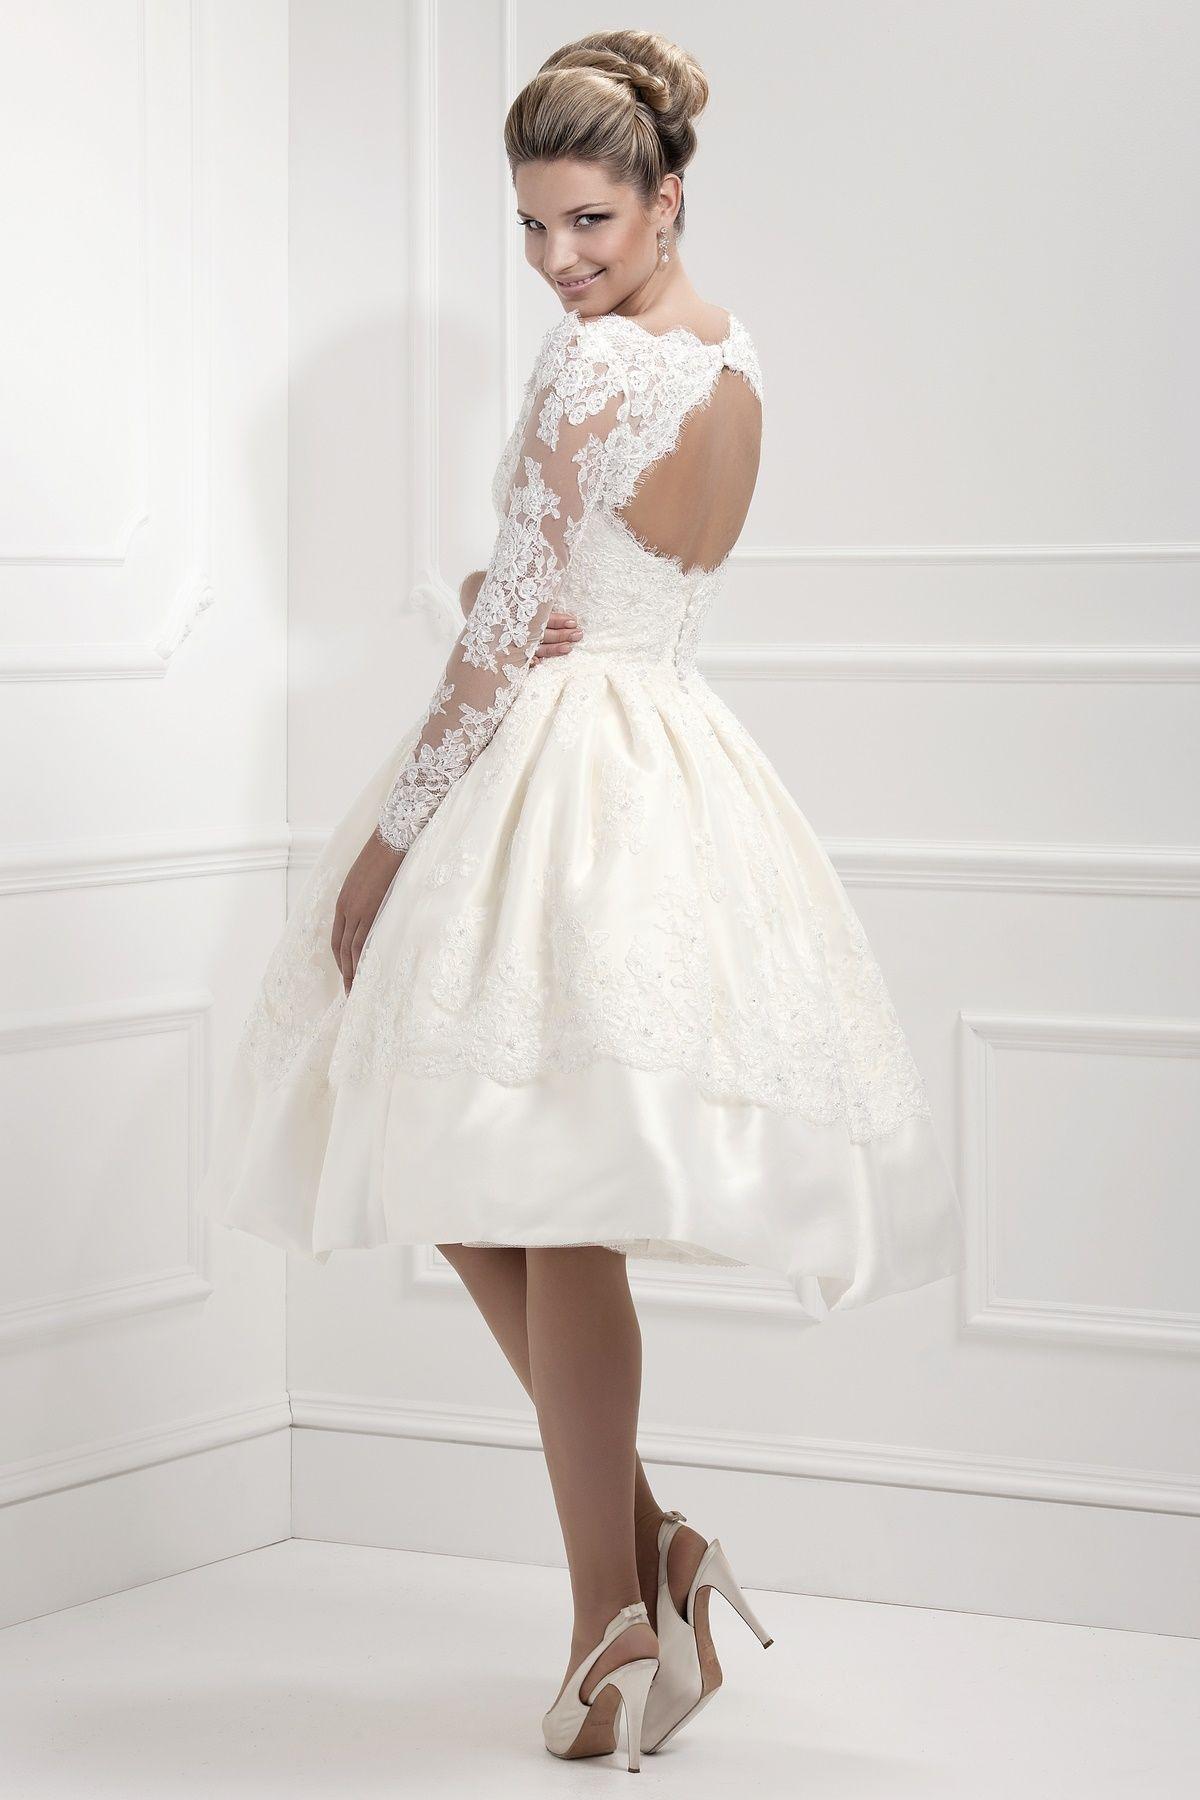 Ellis 2016 Wedding Dress 11317 Short Lace Wedding Dress Long Sleeve Wedding Dress Lace Short Wedding Dress